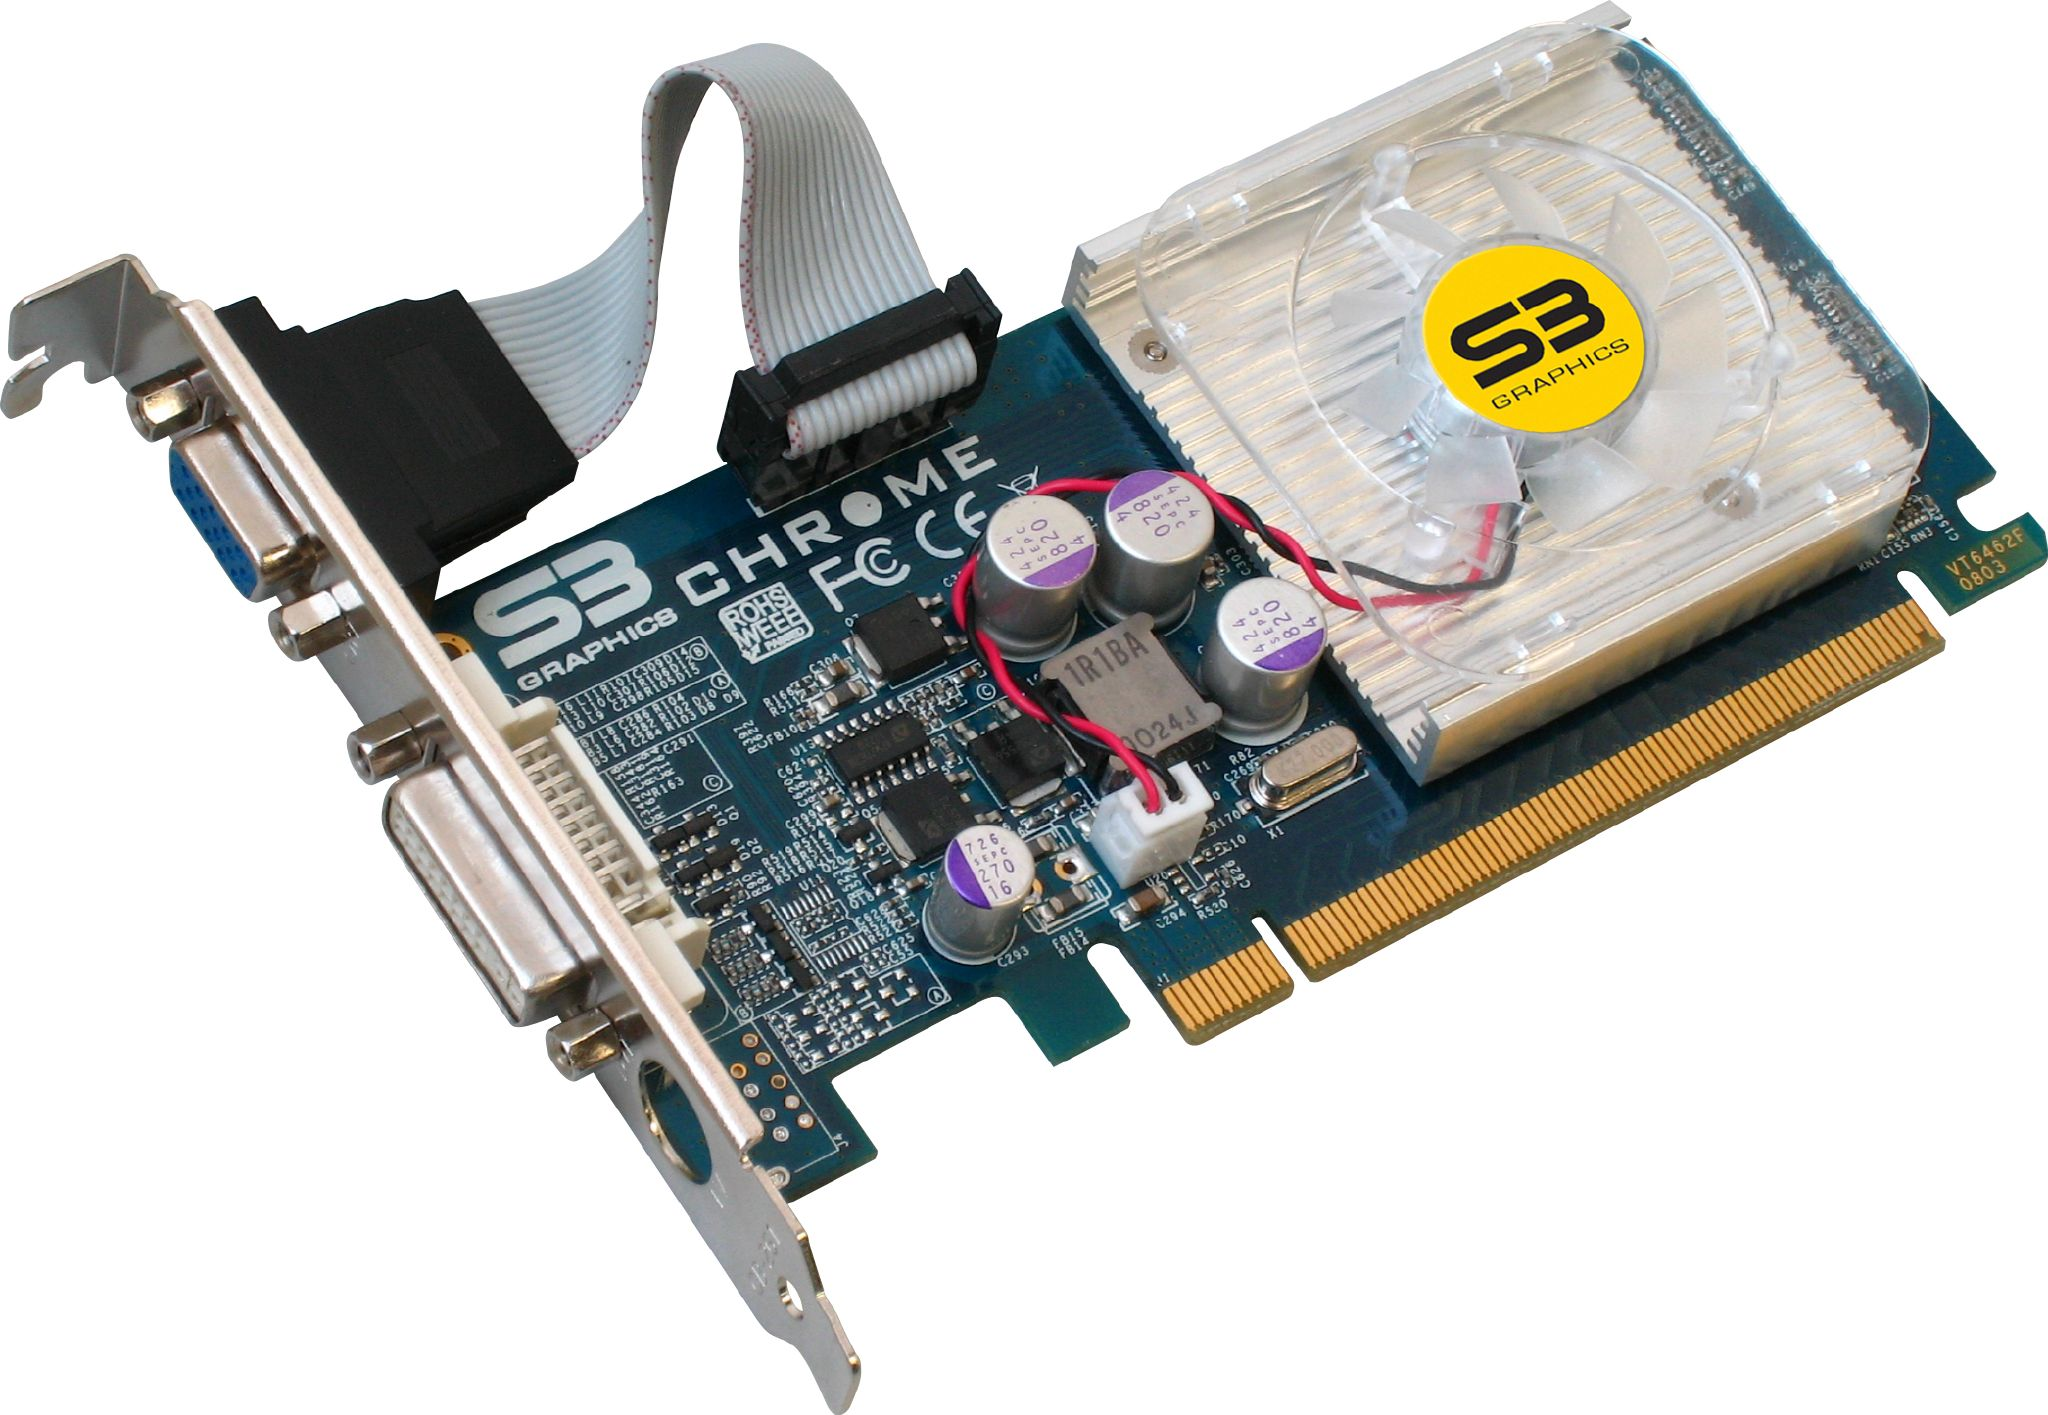 S3 Graphics Chrome PCIe Driver (2019)